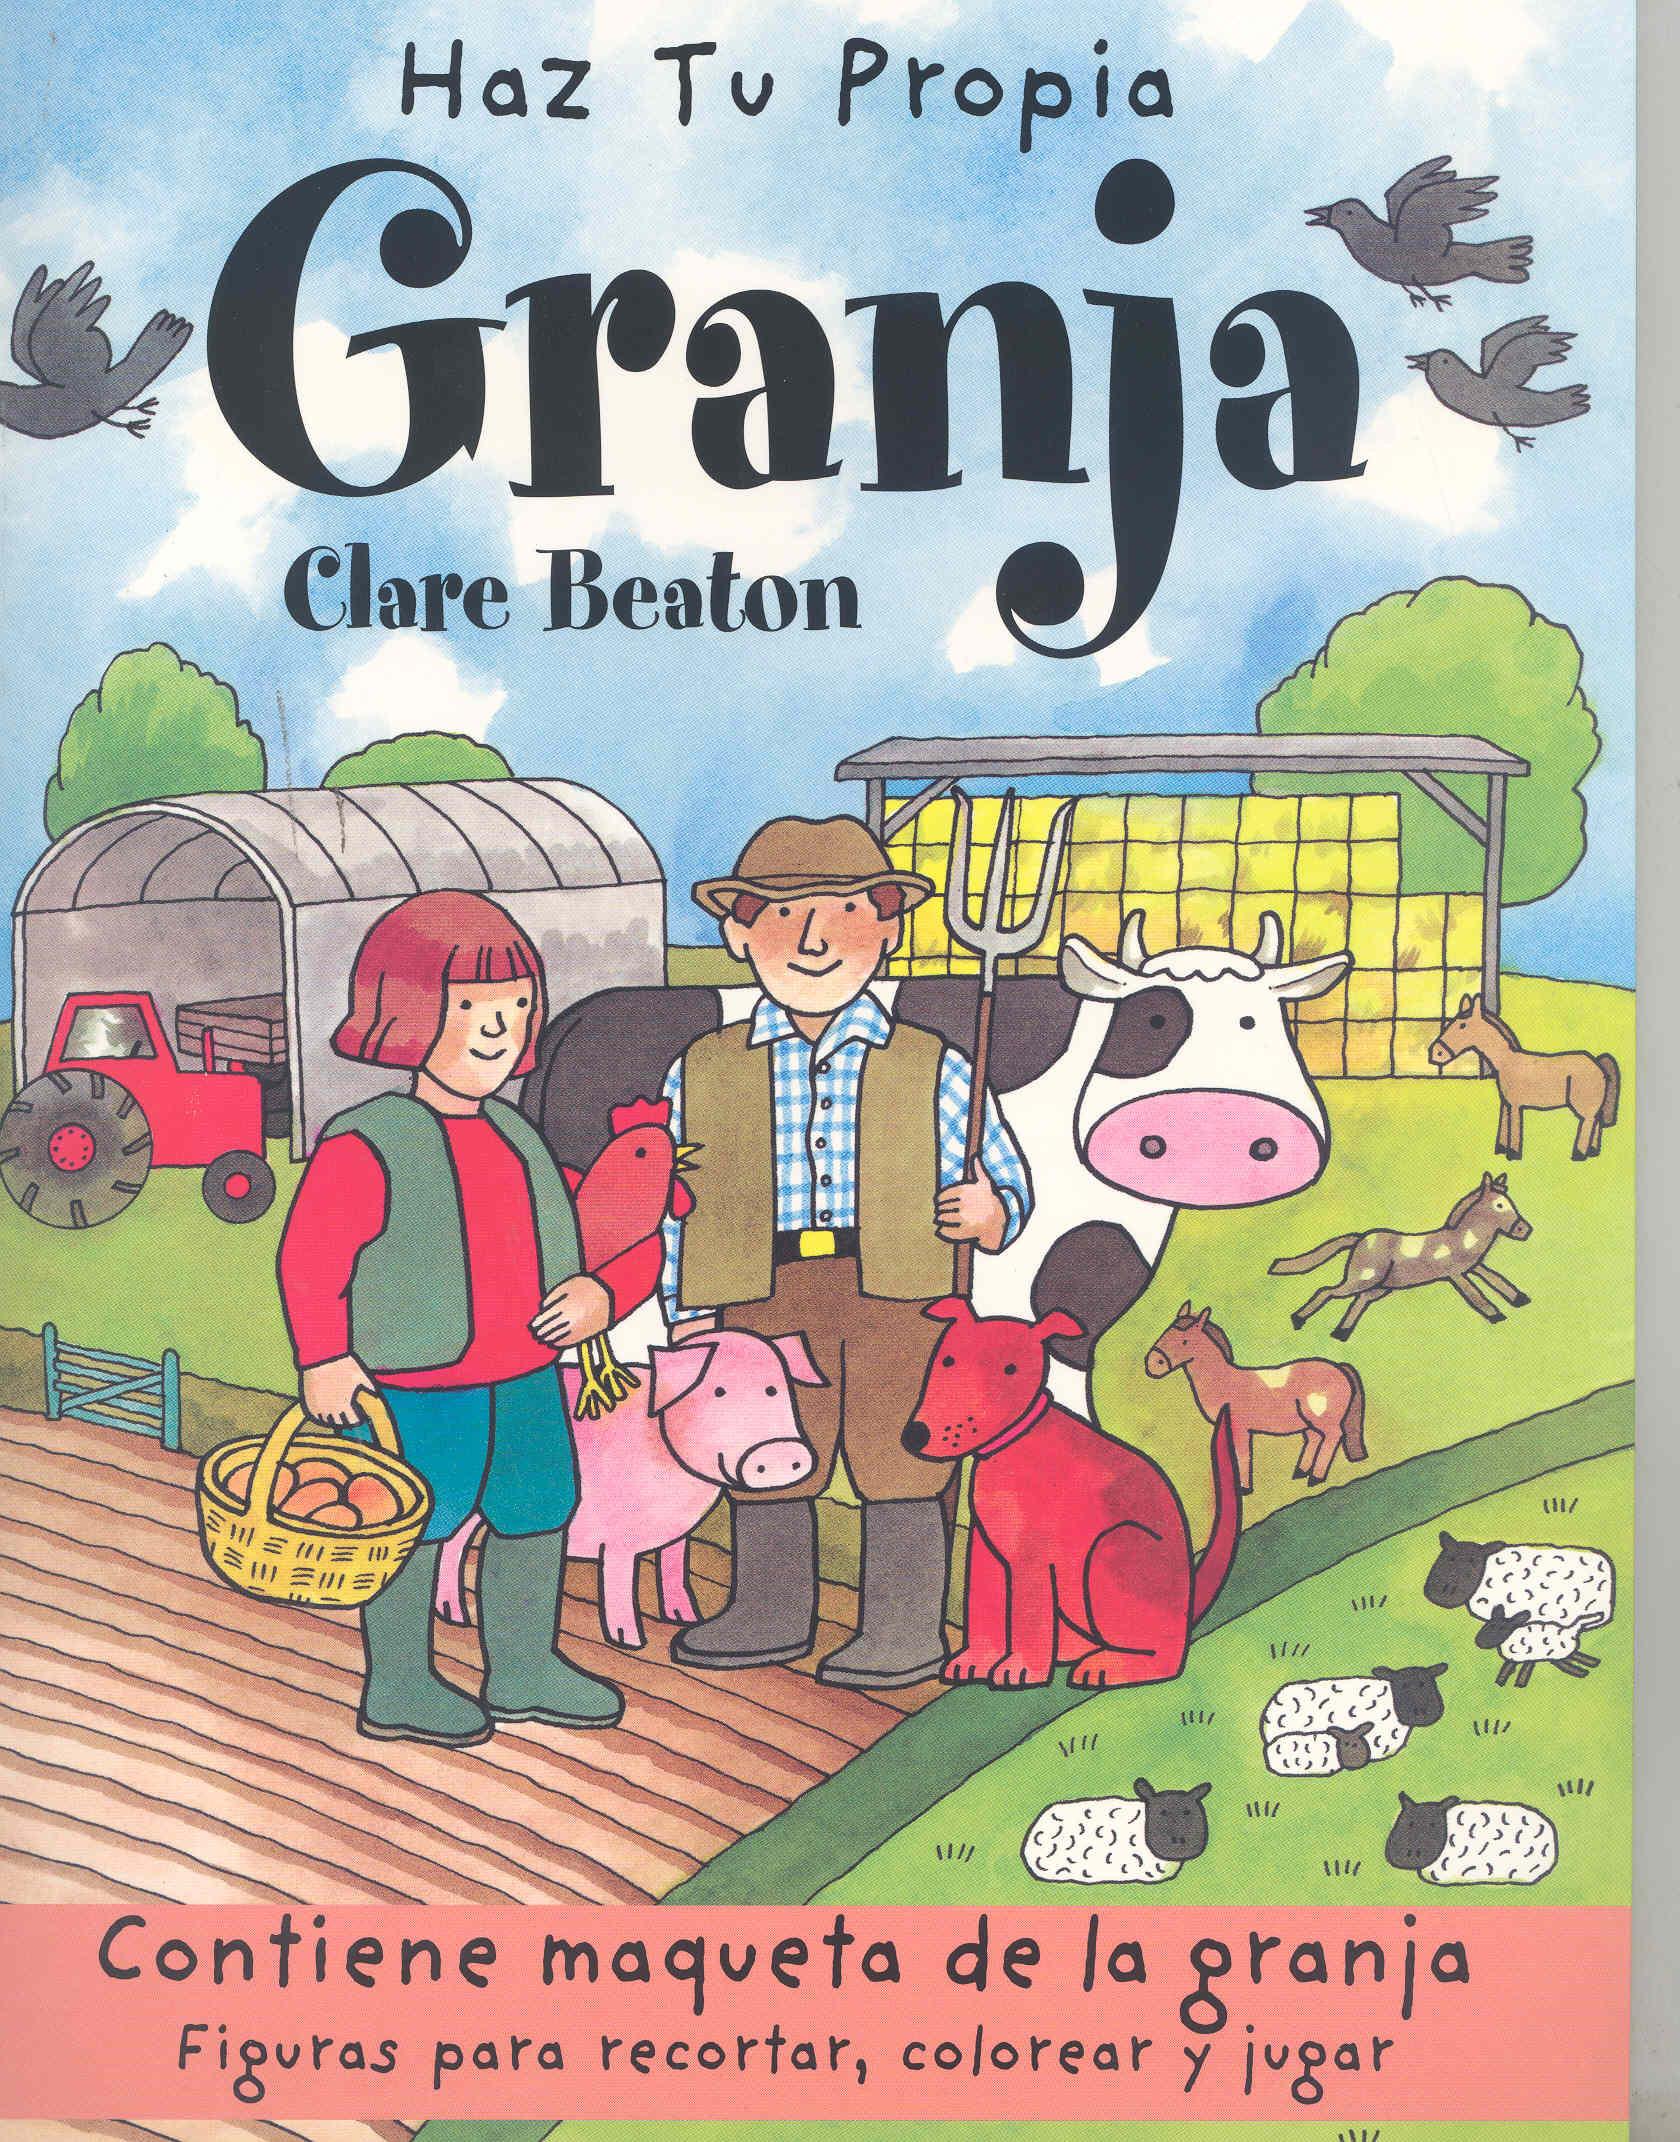 Haz Tu Propia Granja por Clare Beaton